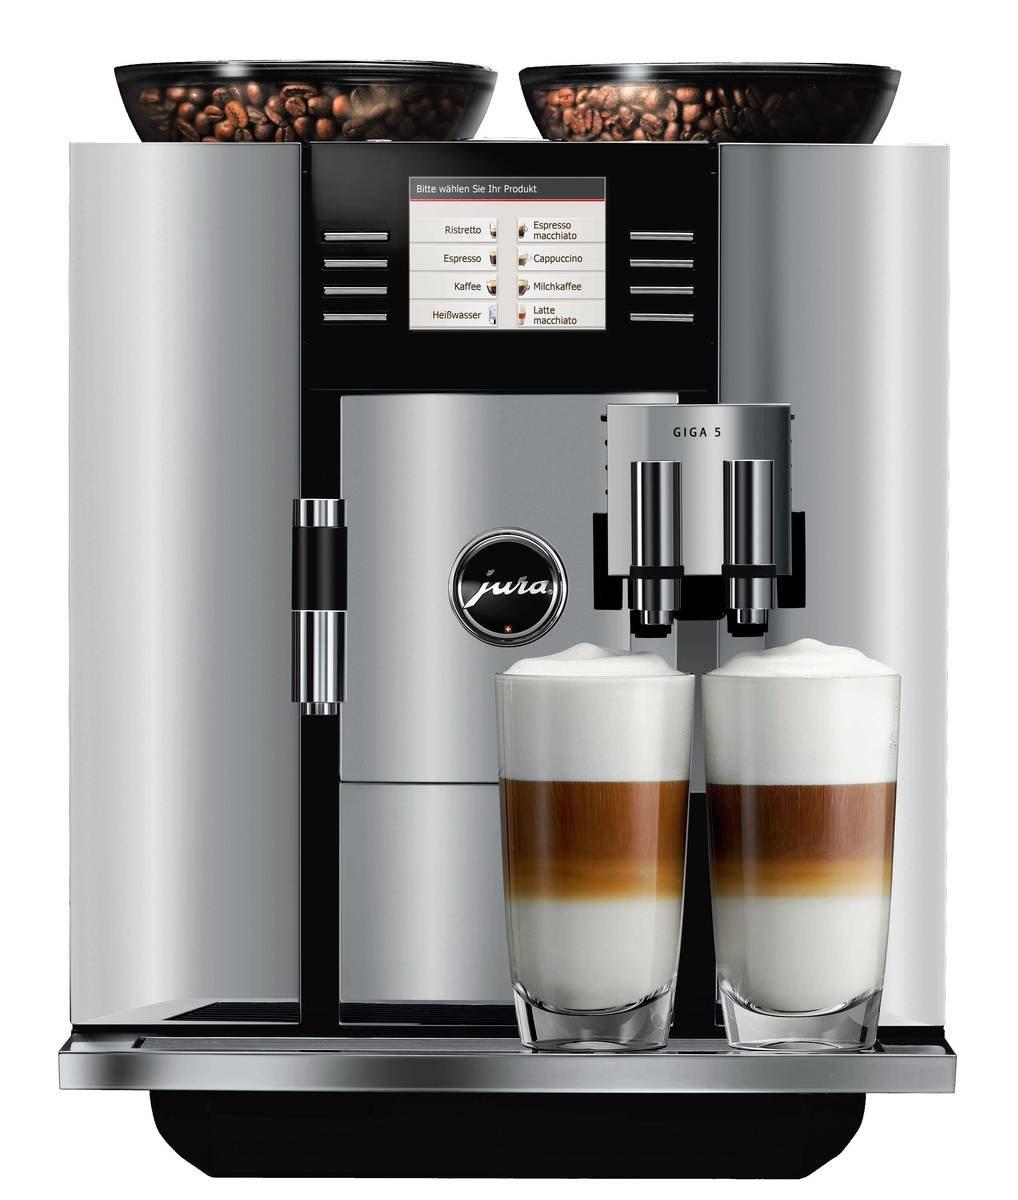 Jura 13623 Giga 5 Automatic Coffee Machine, Aluminum by Jura